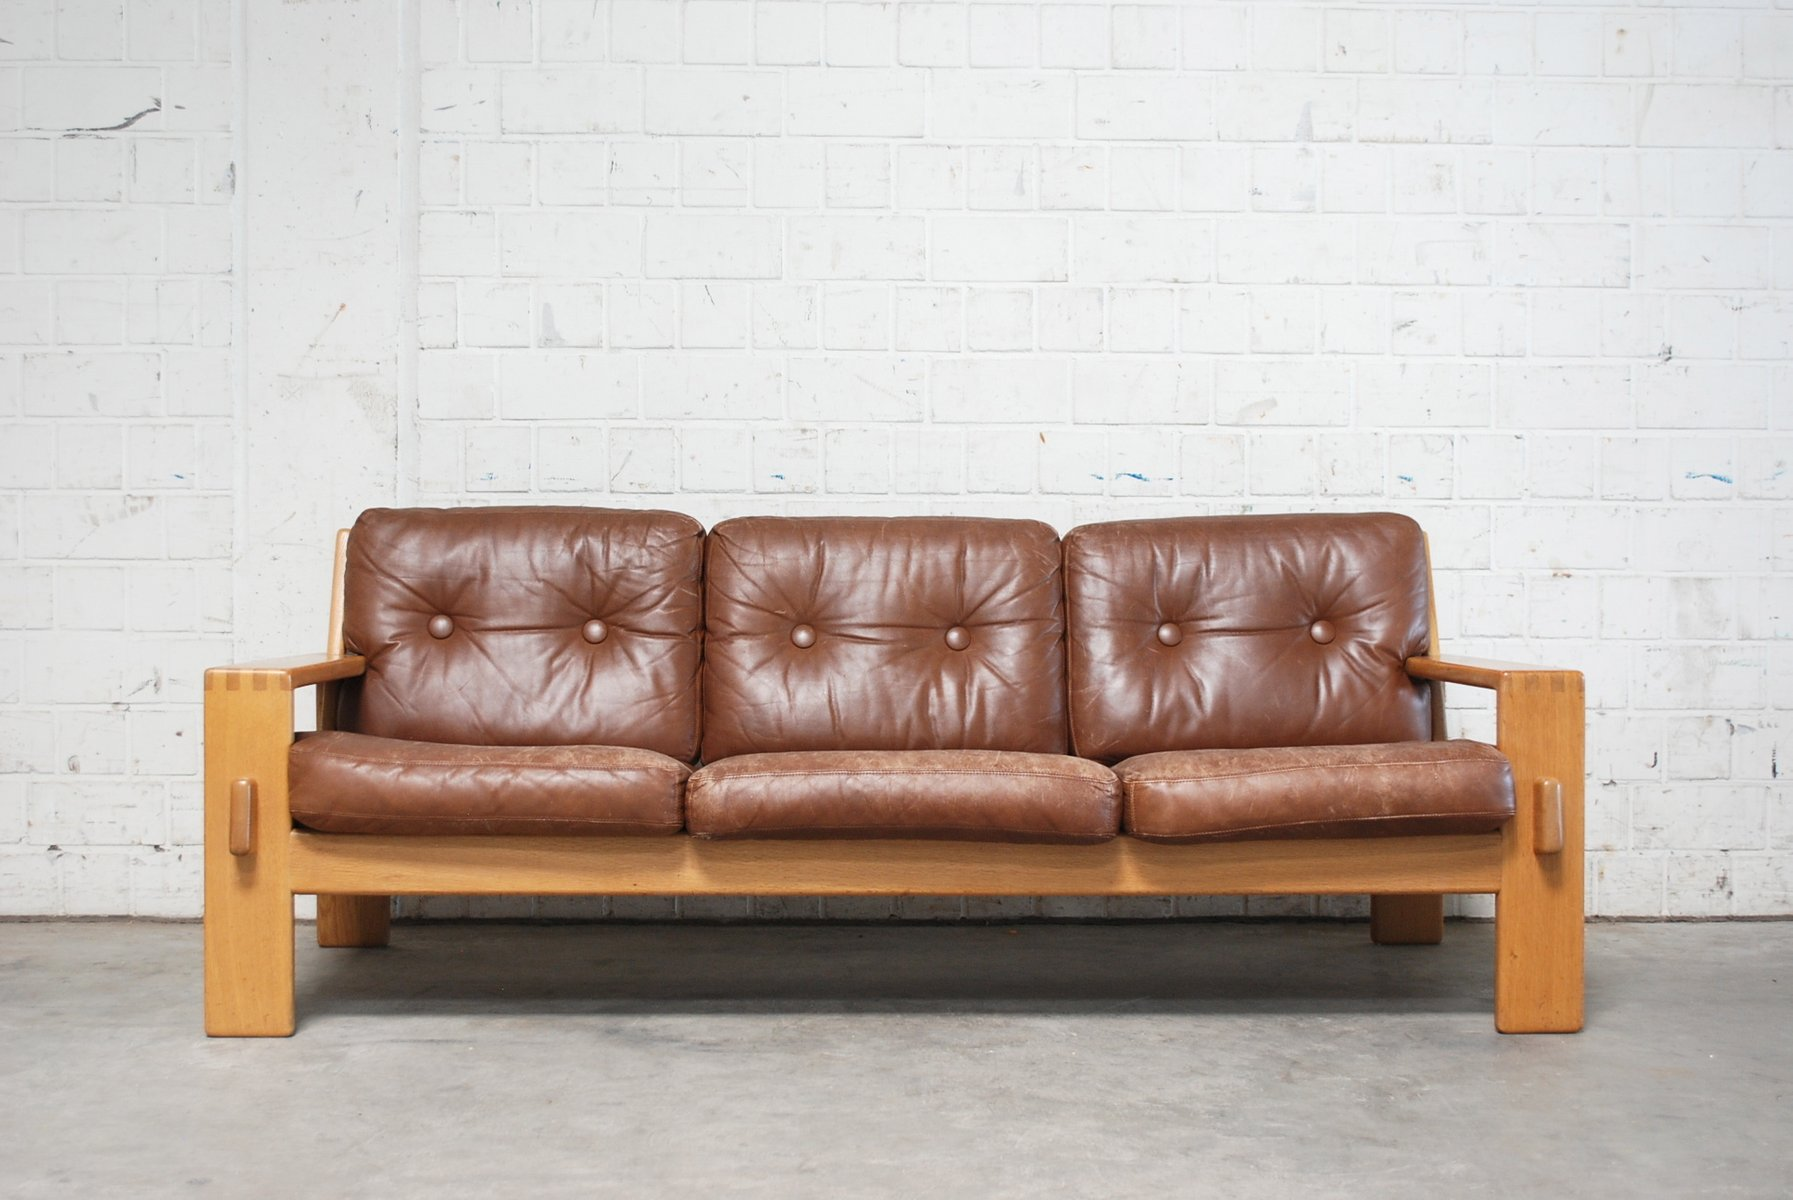 vintage bonanza cognac brown leather sofa by esko pajamies for asko for sale at pamono. Black Bedroom Furniture Sets. Home Design Ideas